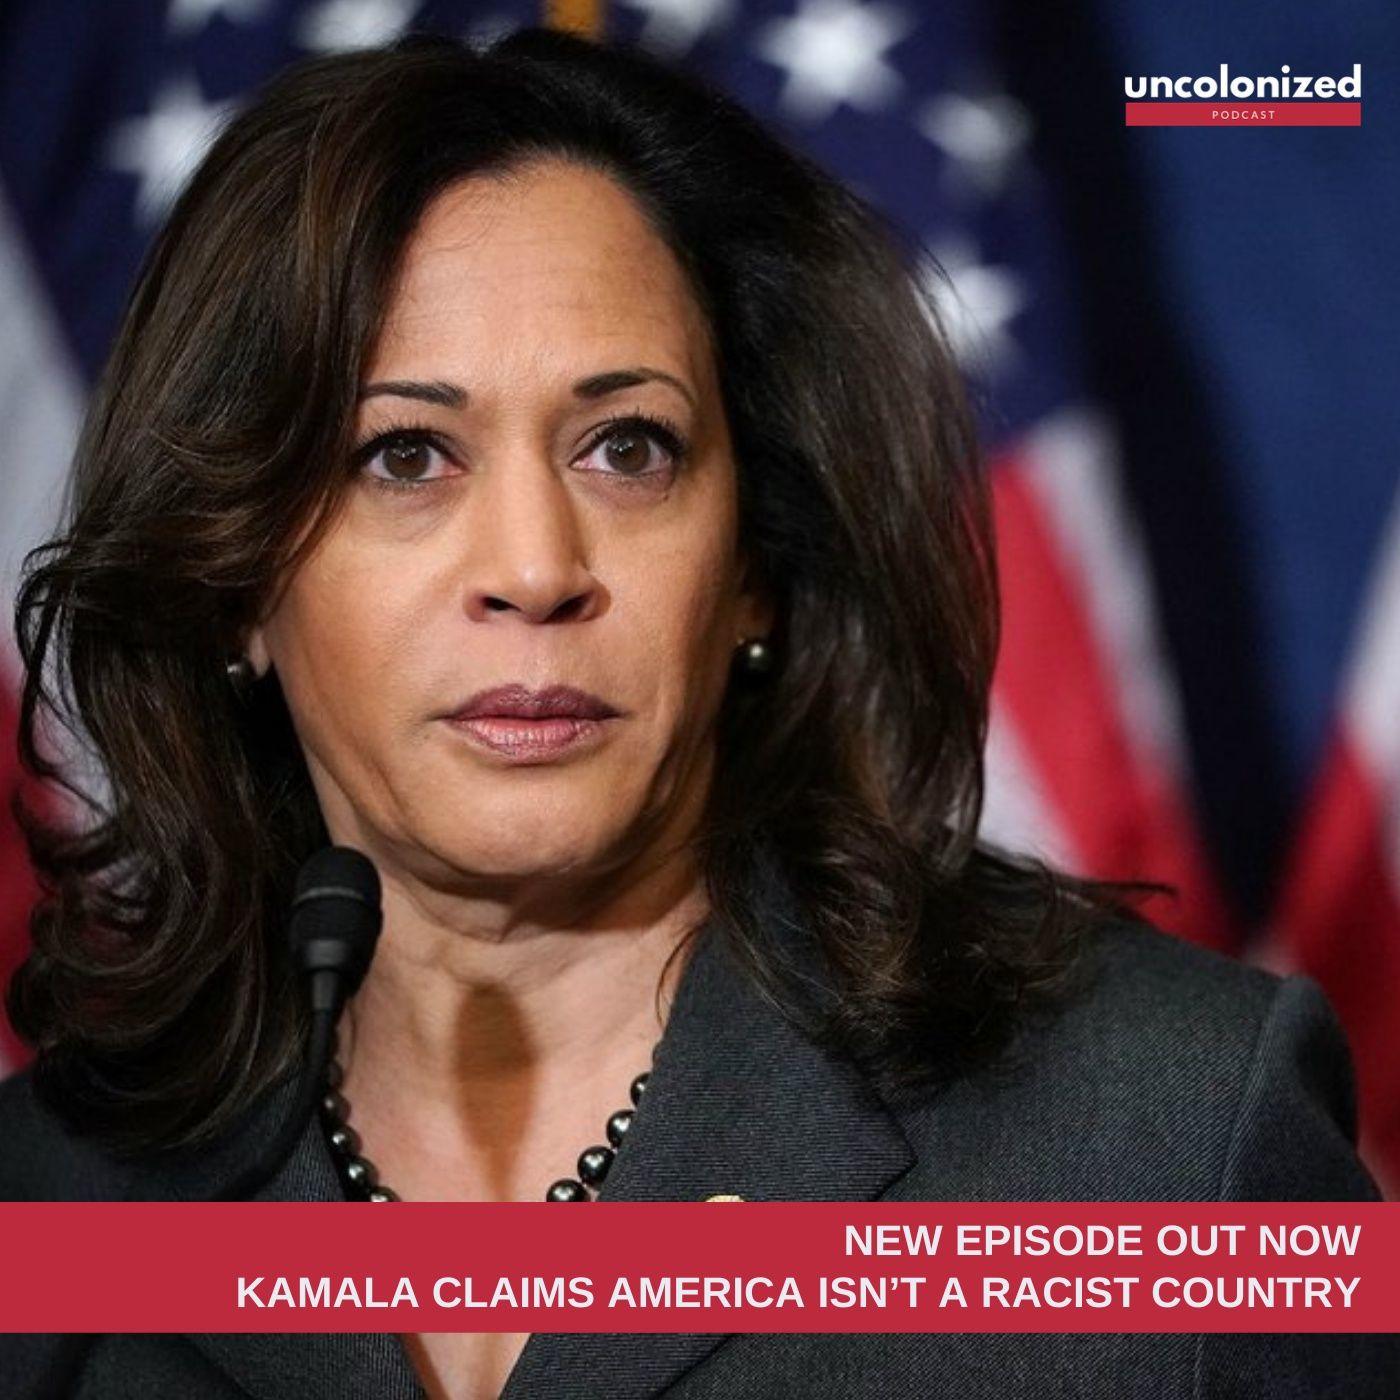 S07E04: We got news for you Kamala